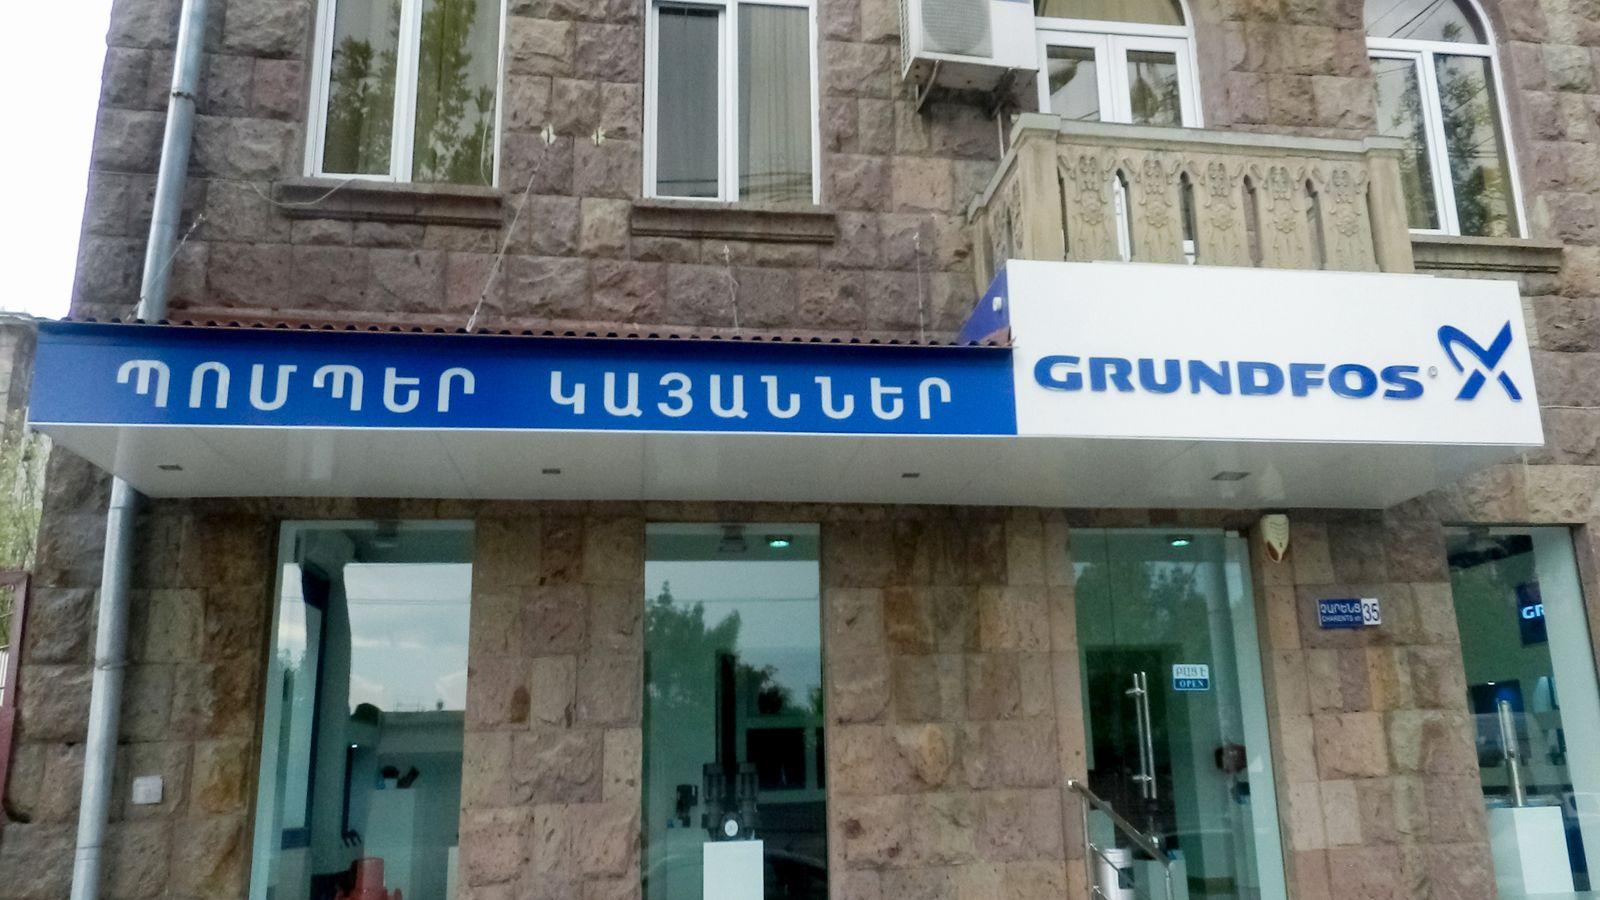 Storefront illuminated letters